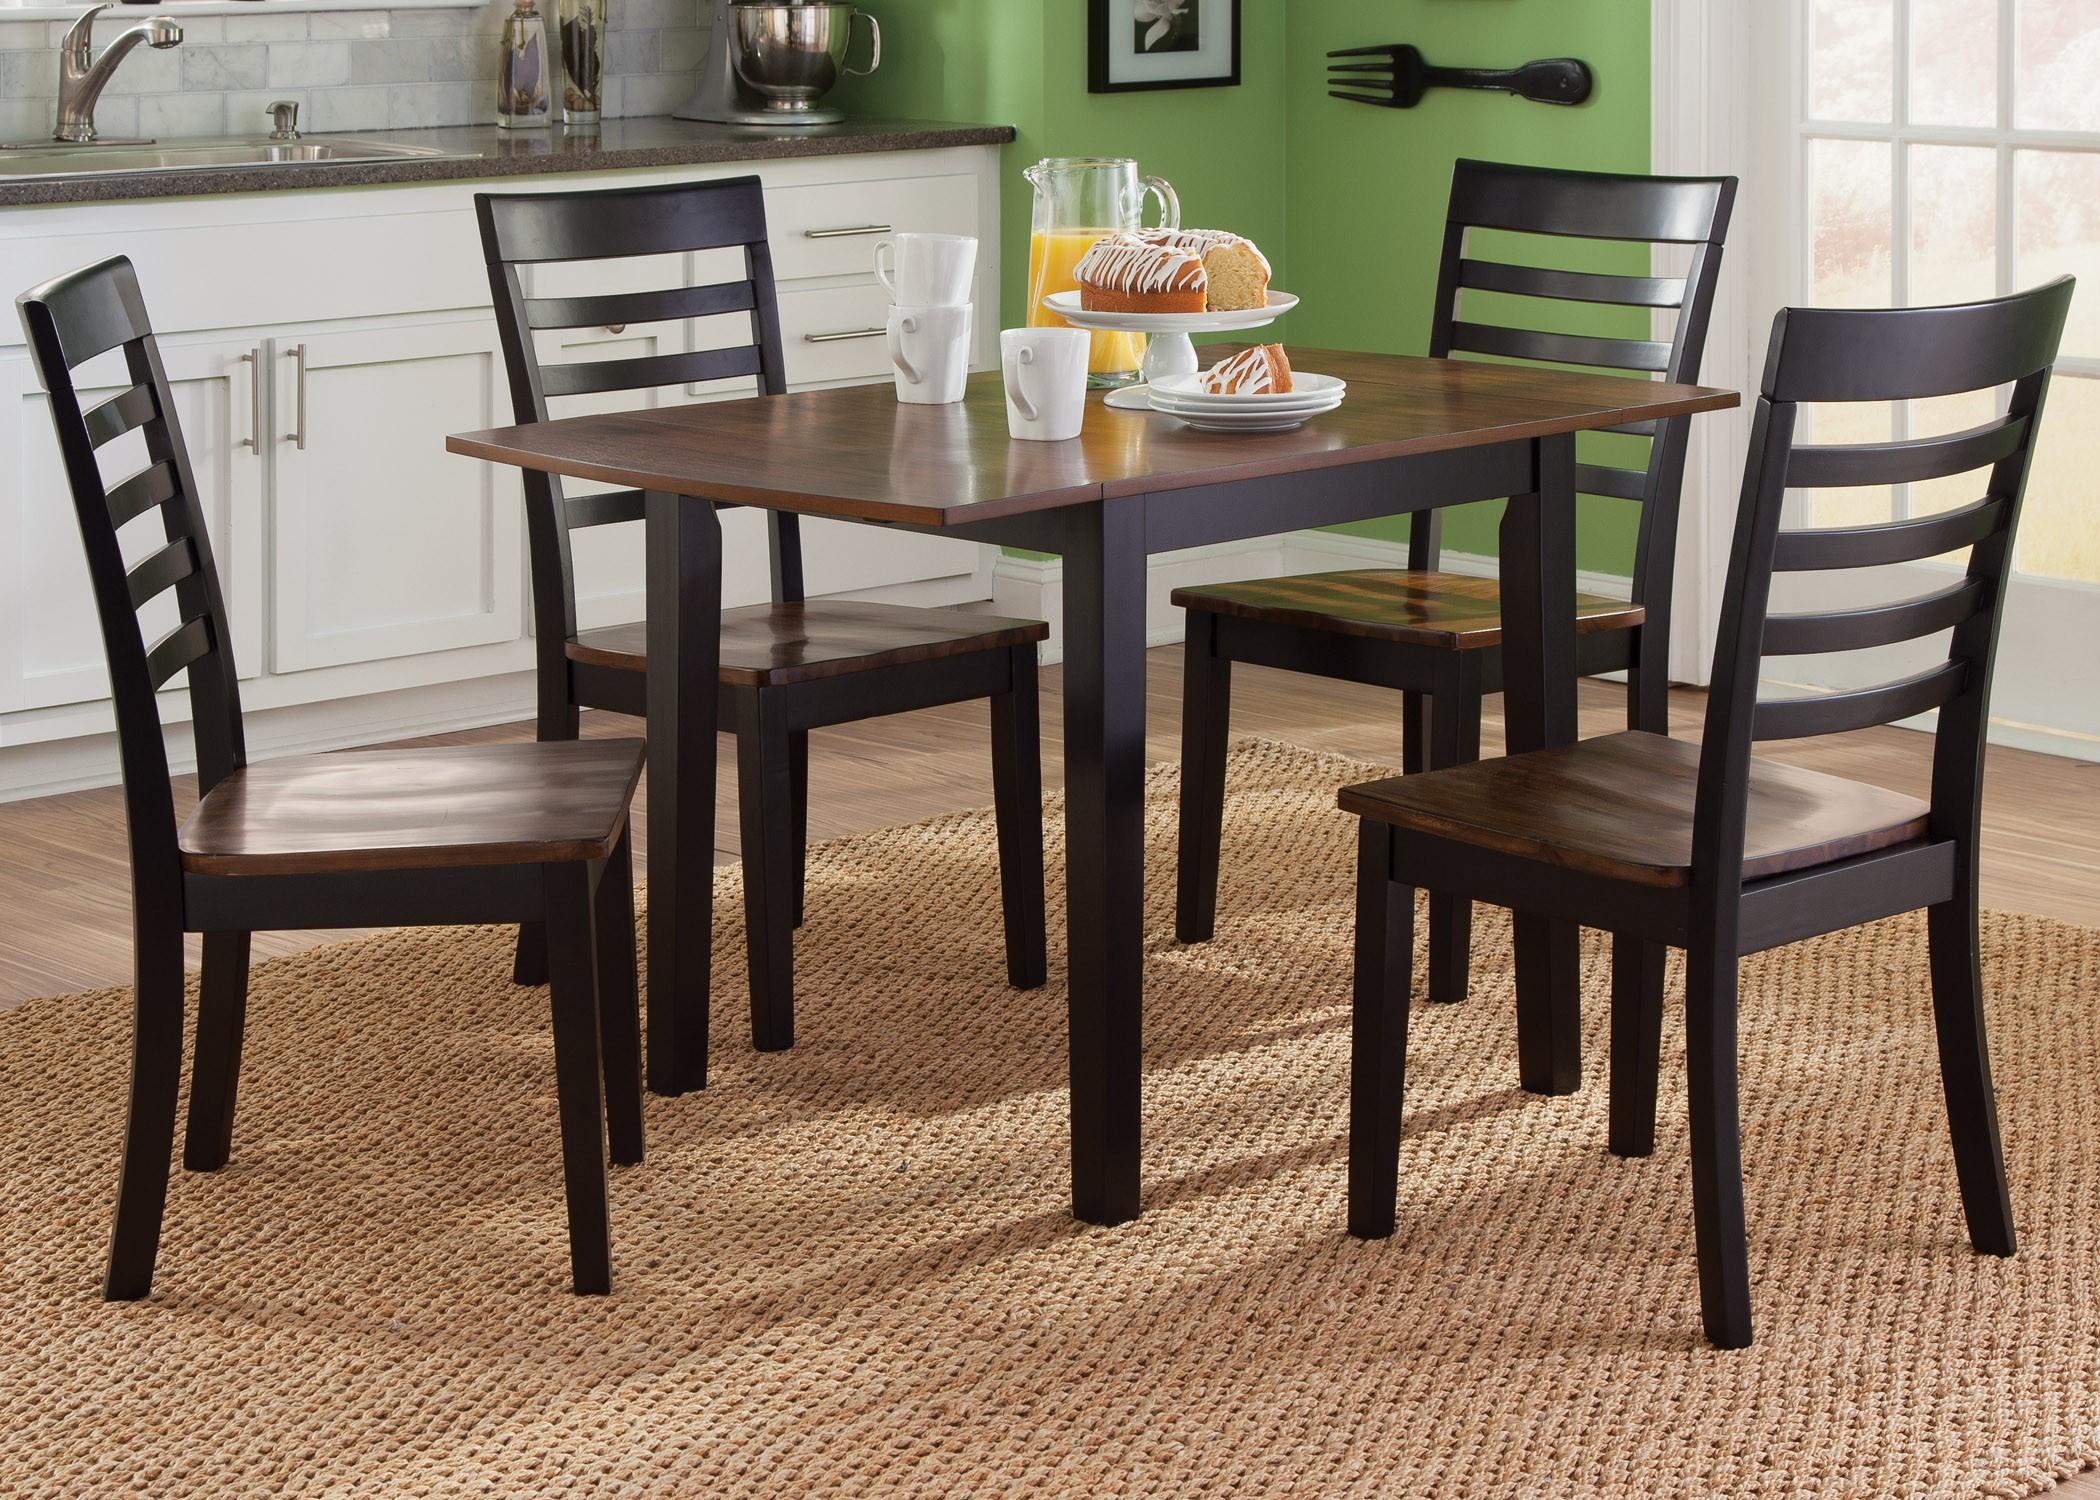 dining room sets with leaf   Cafe Black and Cherry Drop Leaf Dining Room Set, 56-T3048 ...